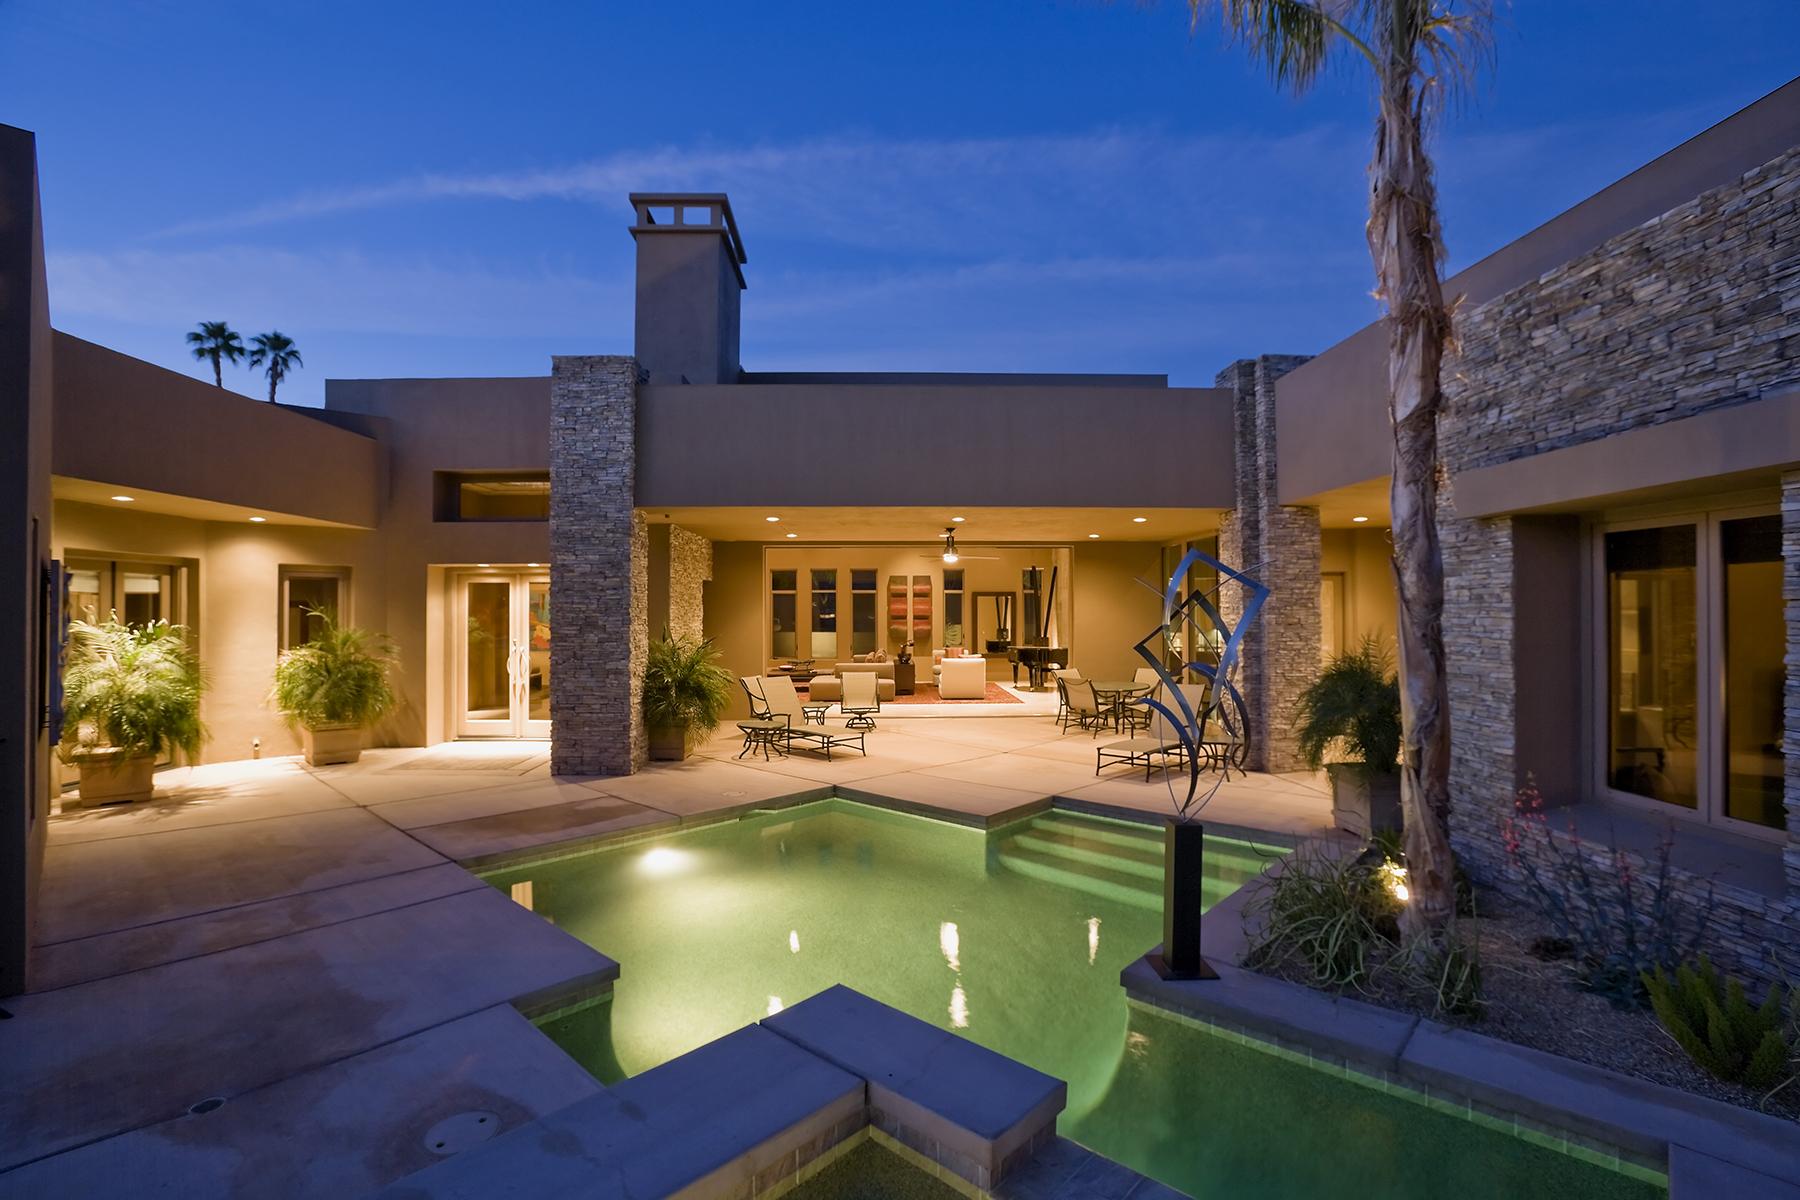 Evening mansion